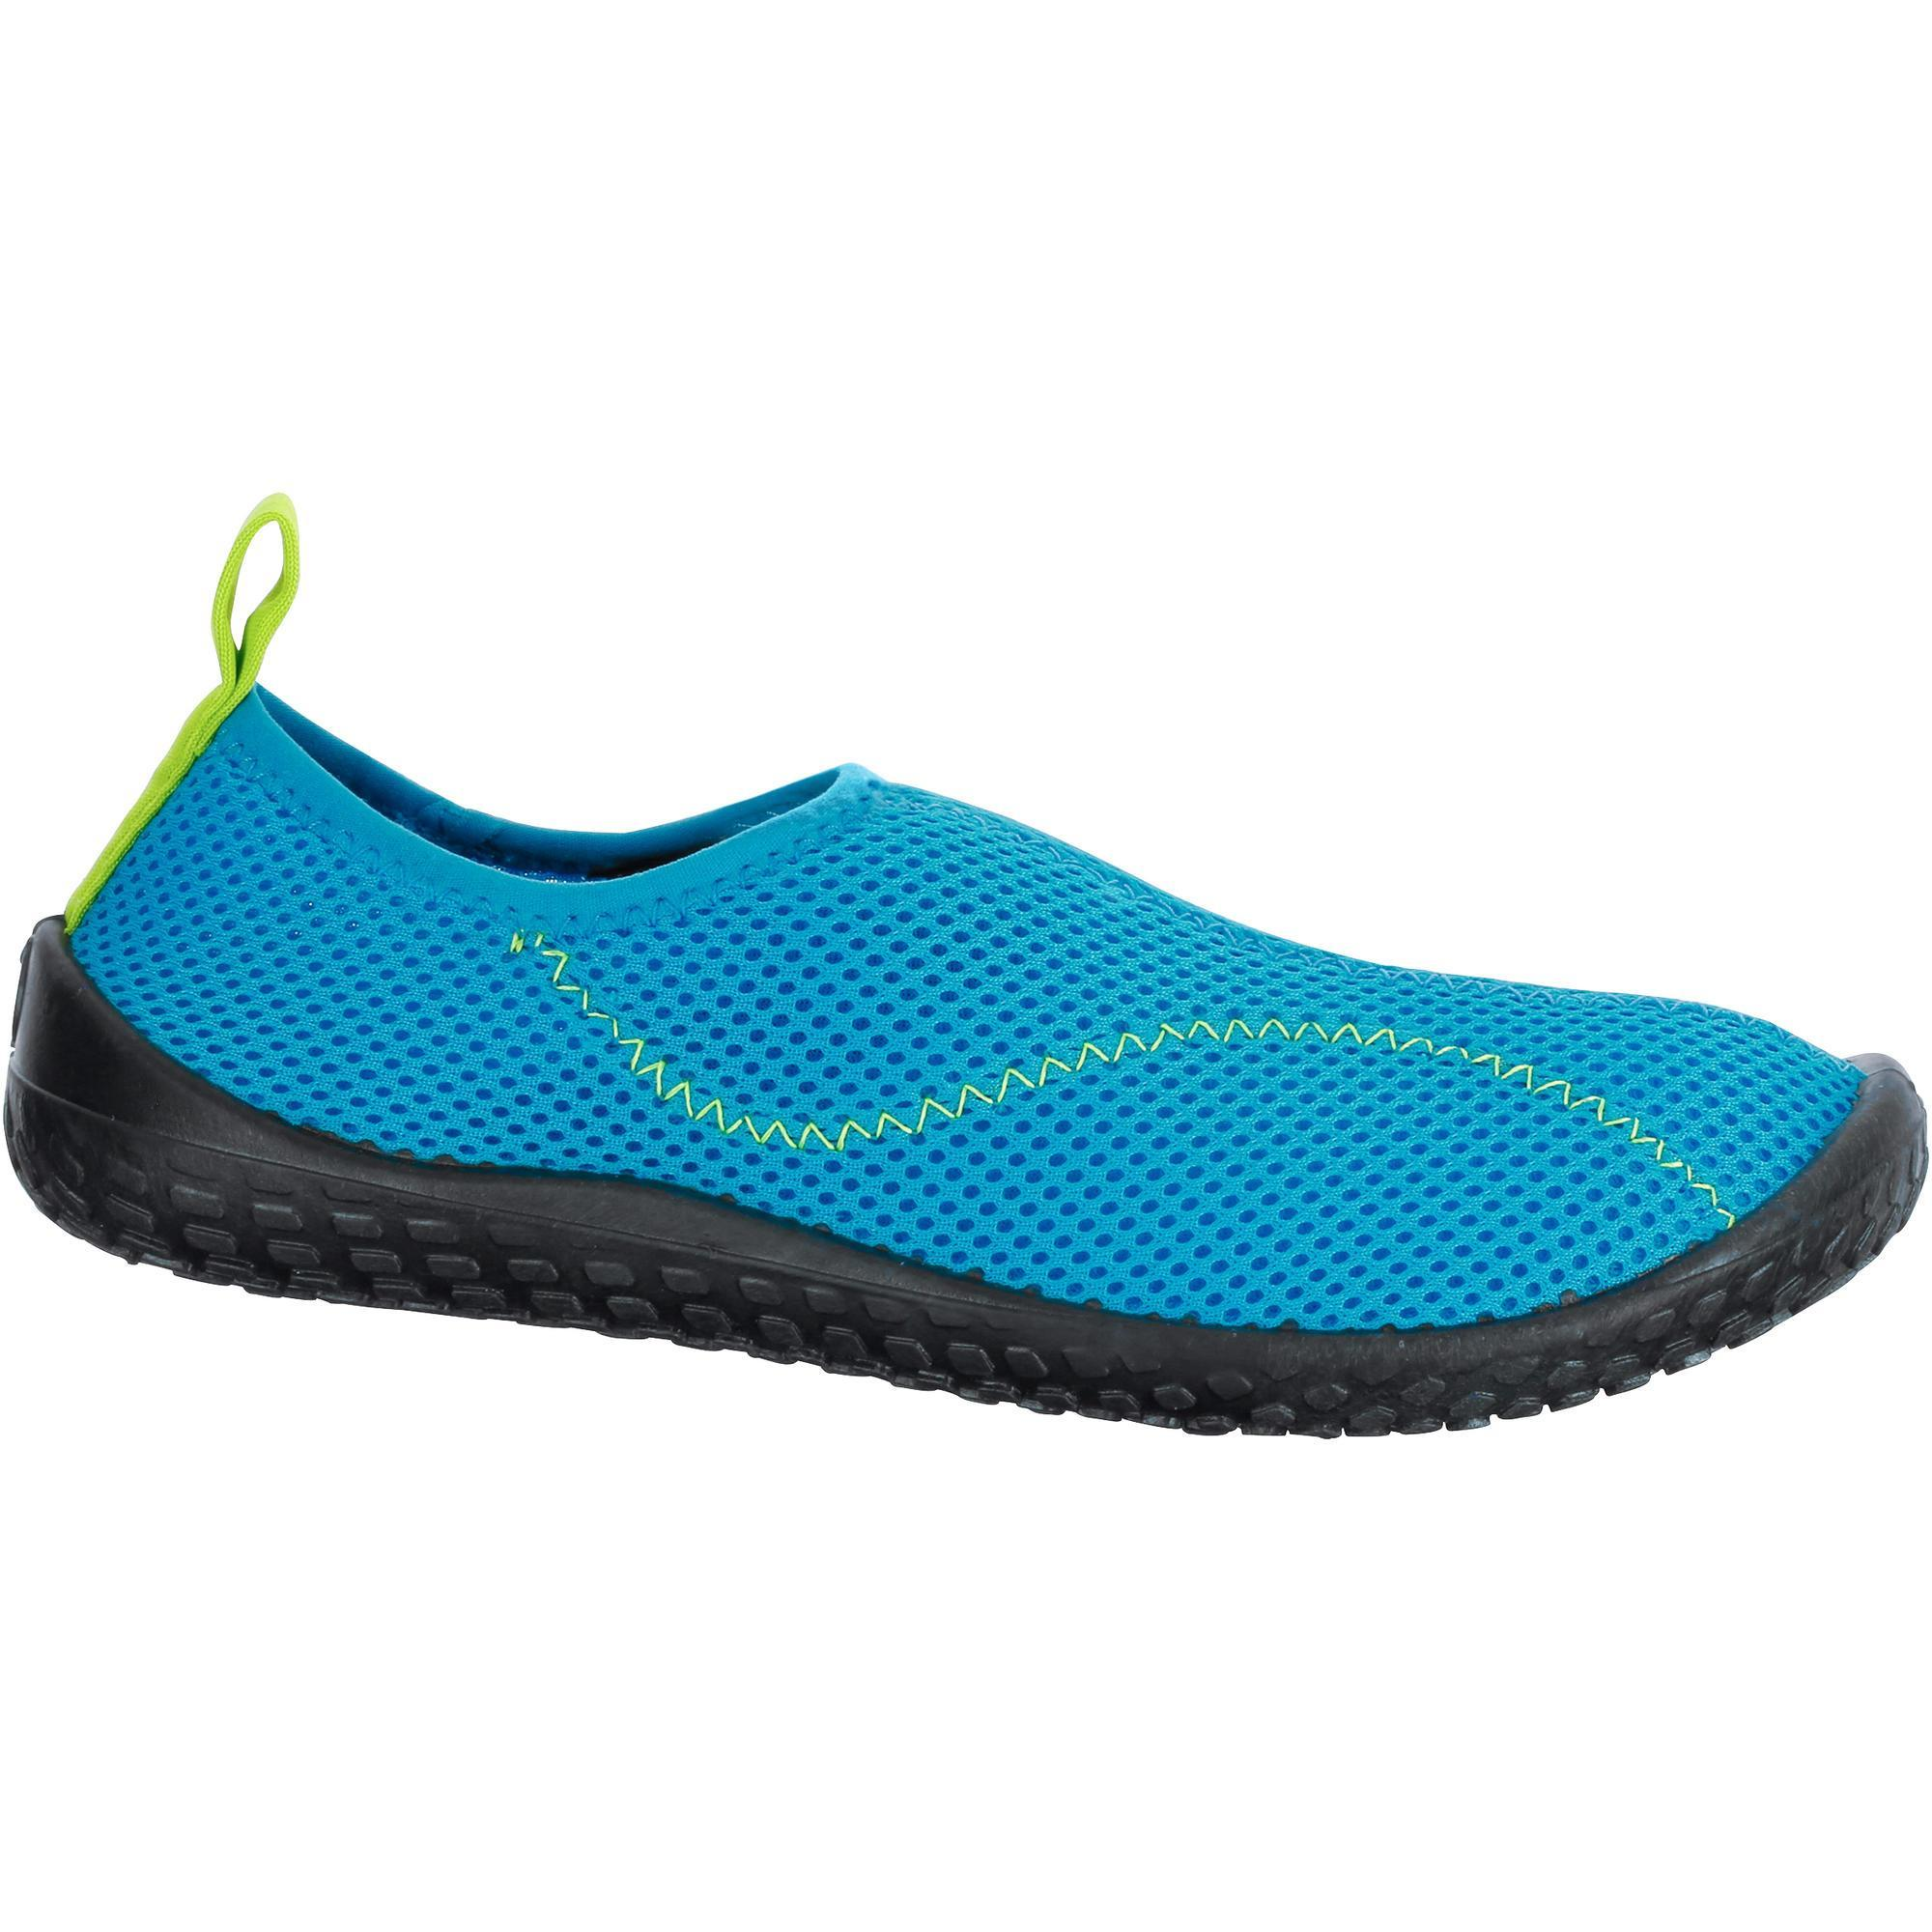 Subea chaussures aquatiques aquashoes 100 enfant bleu - Decathlon chaussures enfant ...